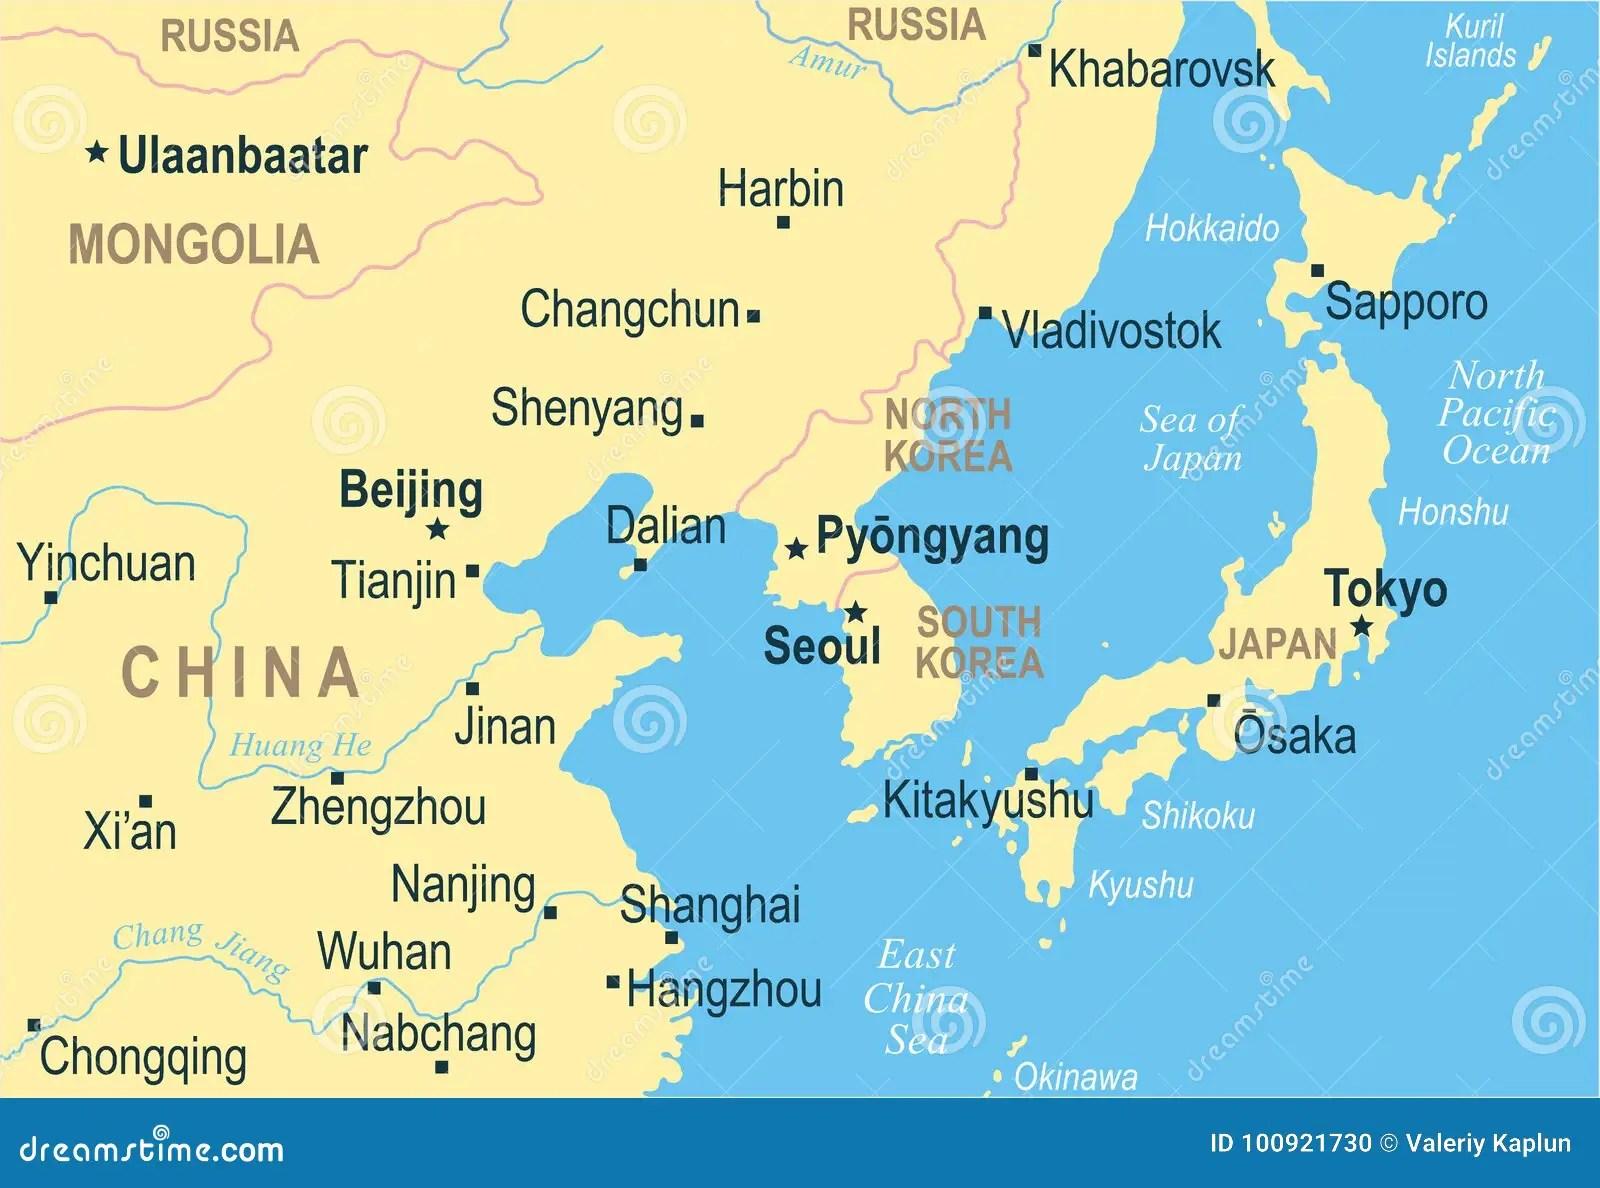 Only Korea Taiw Including South Map Korea China Countries China North Mongolia